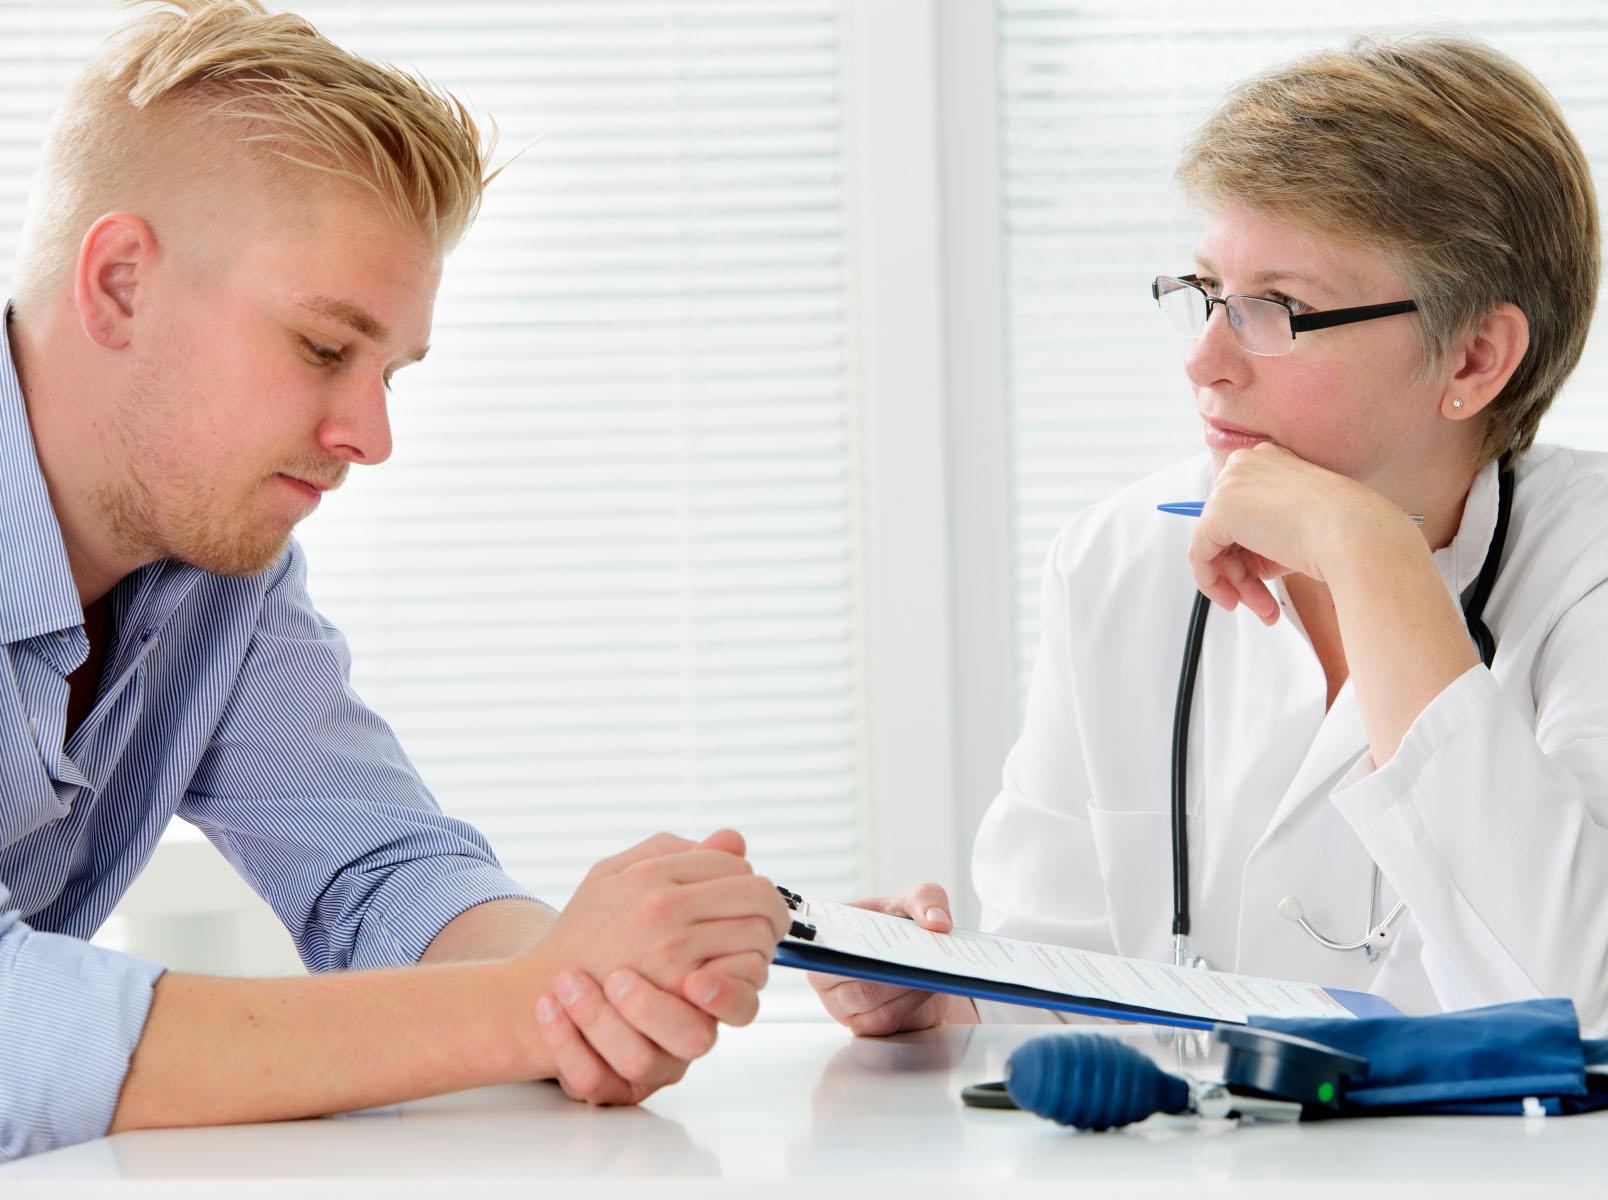 Картинки психиатр с пациентом